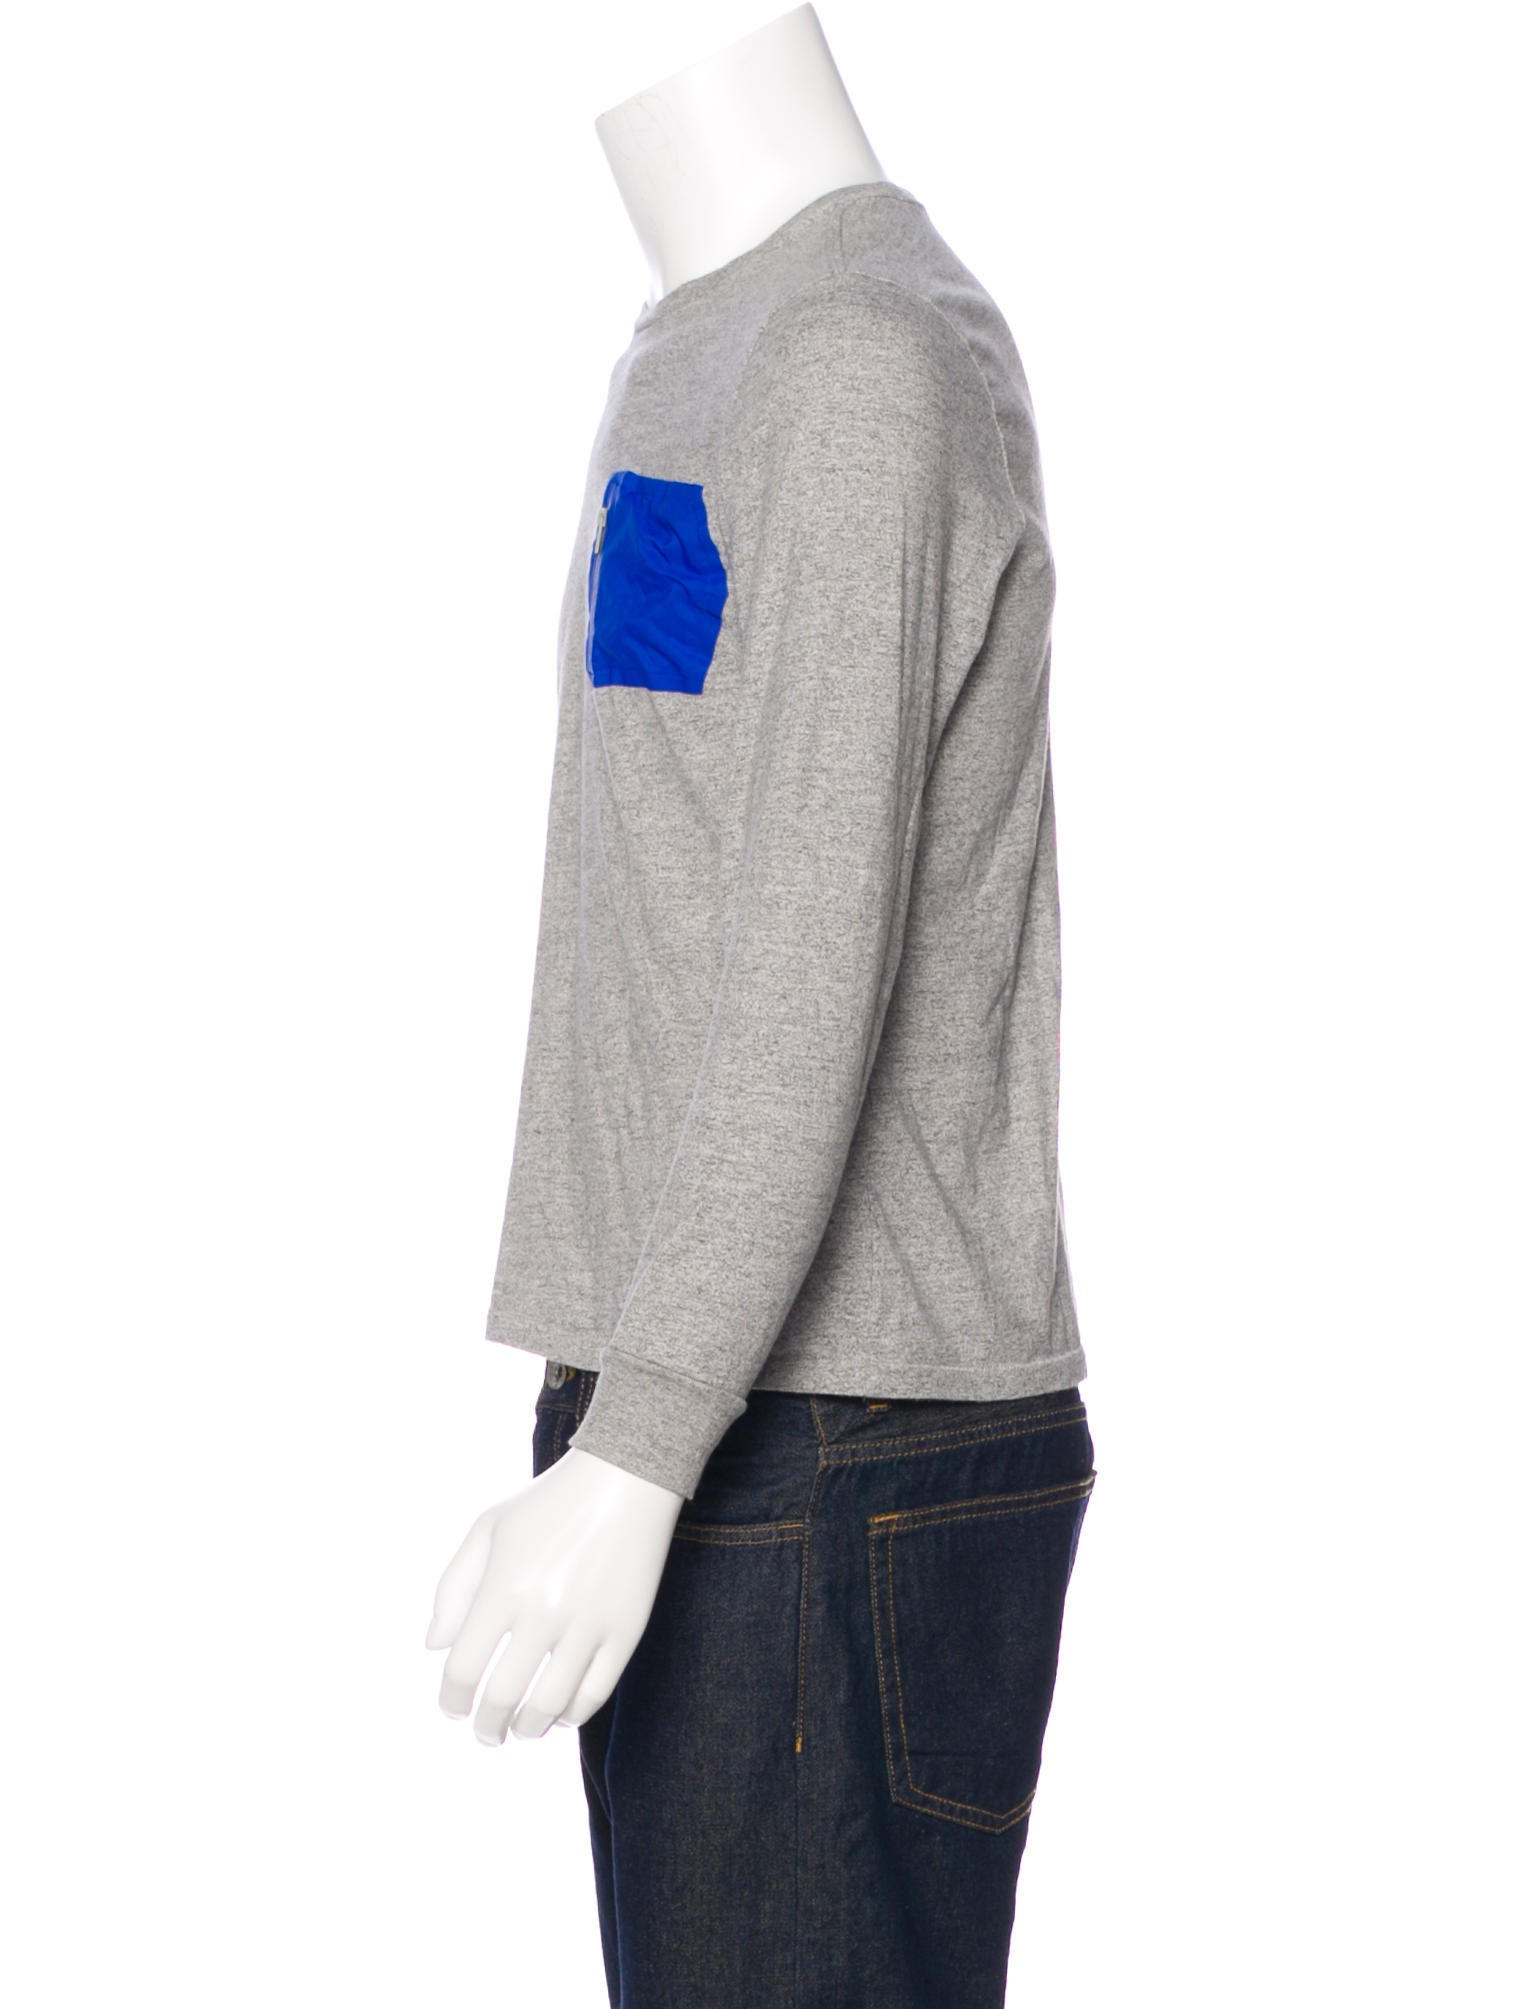 Jack spade long sleeve pocket t shirt clothing for Long sleeve pocket shirts